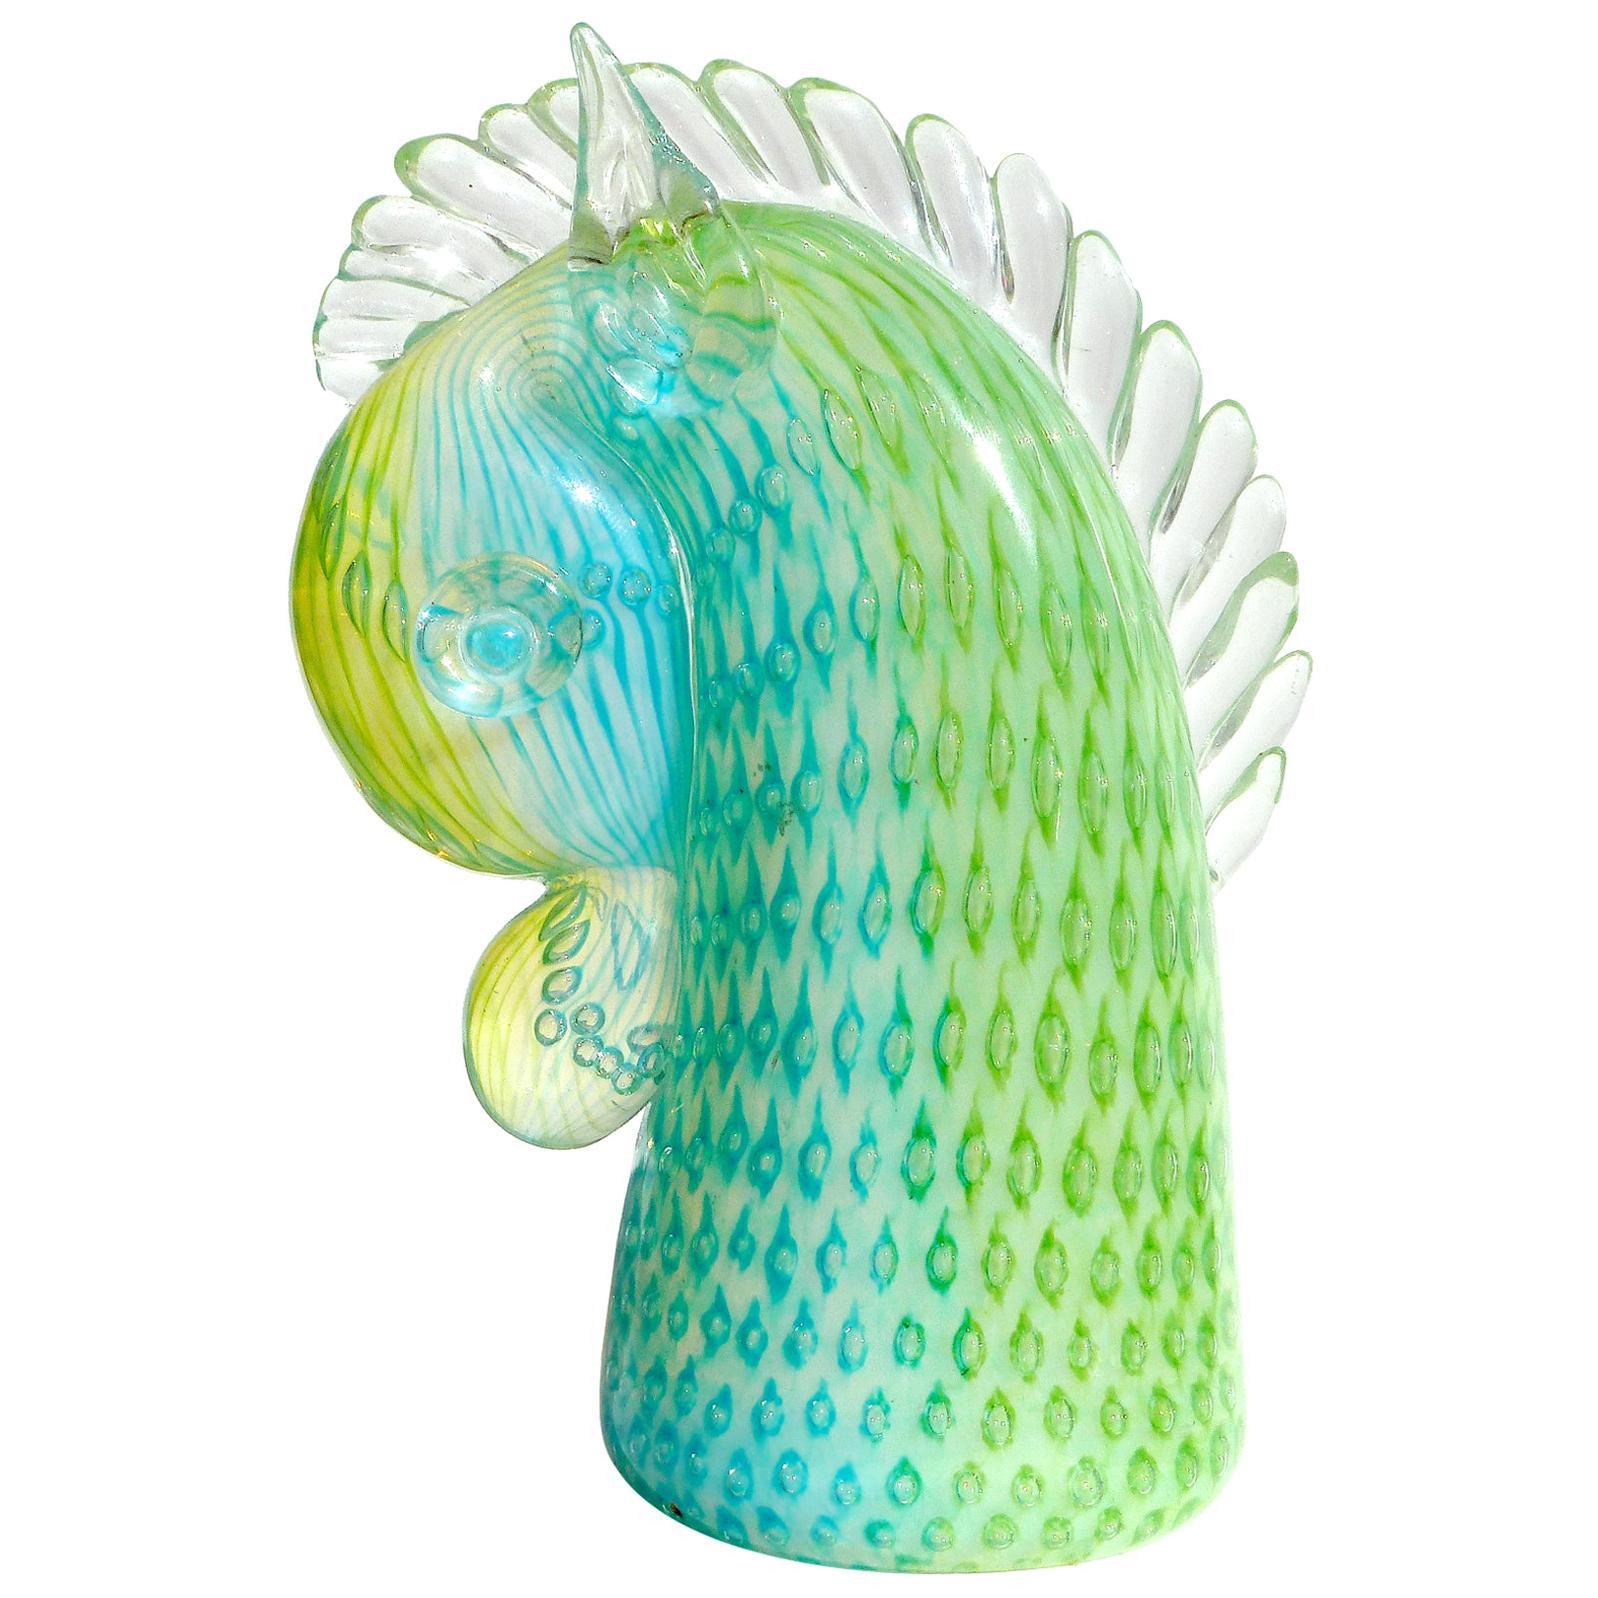 Murano Opalescent Blue Green Italian Art Glass Horse Pony Paperweight Sculpture